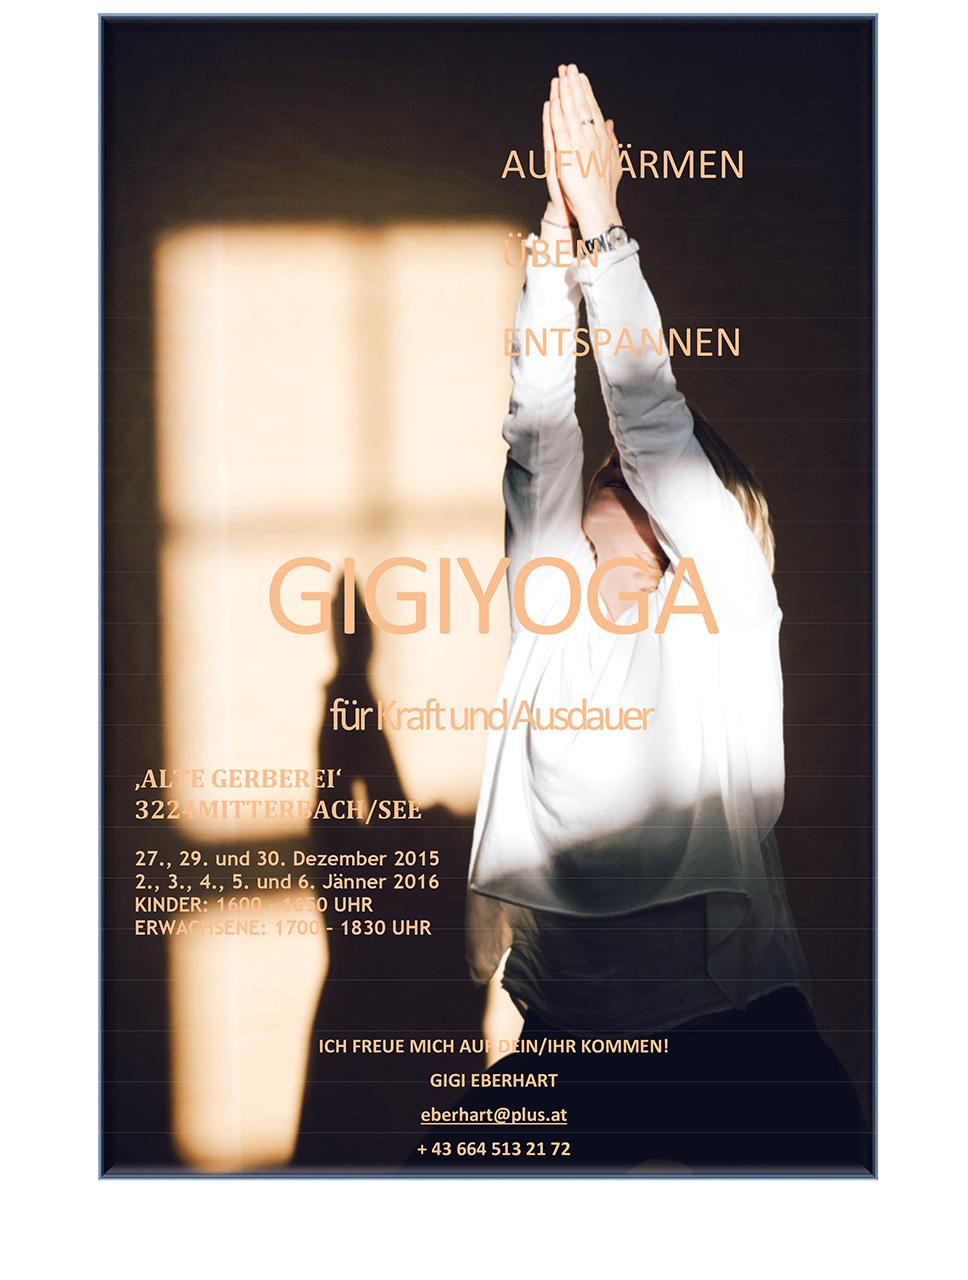 Gigi-Yoga-2015